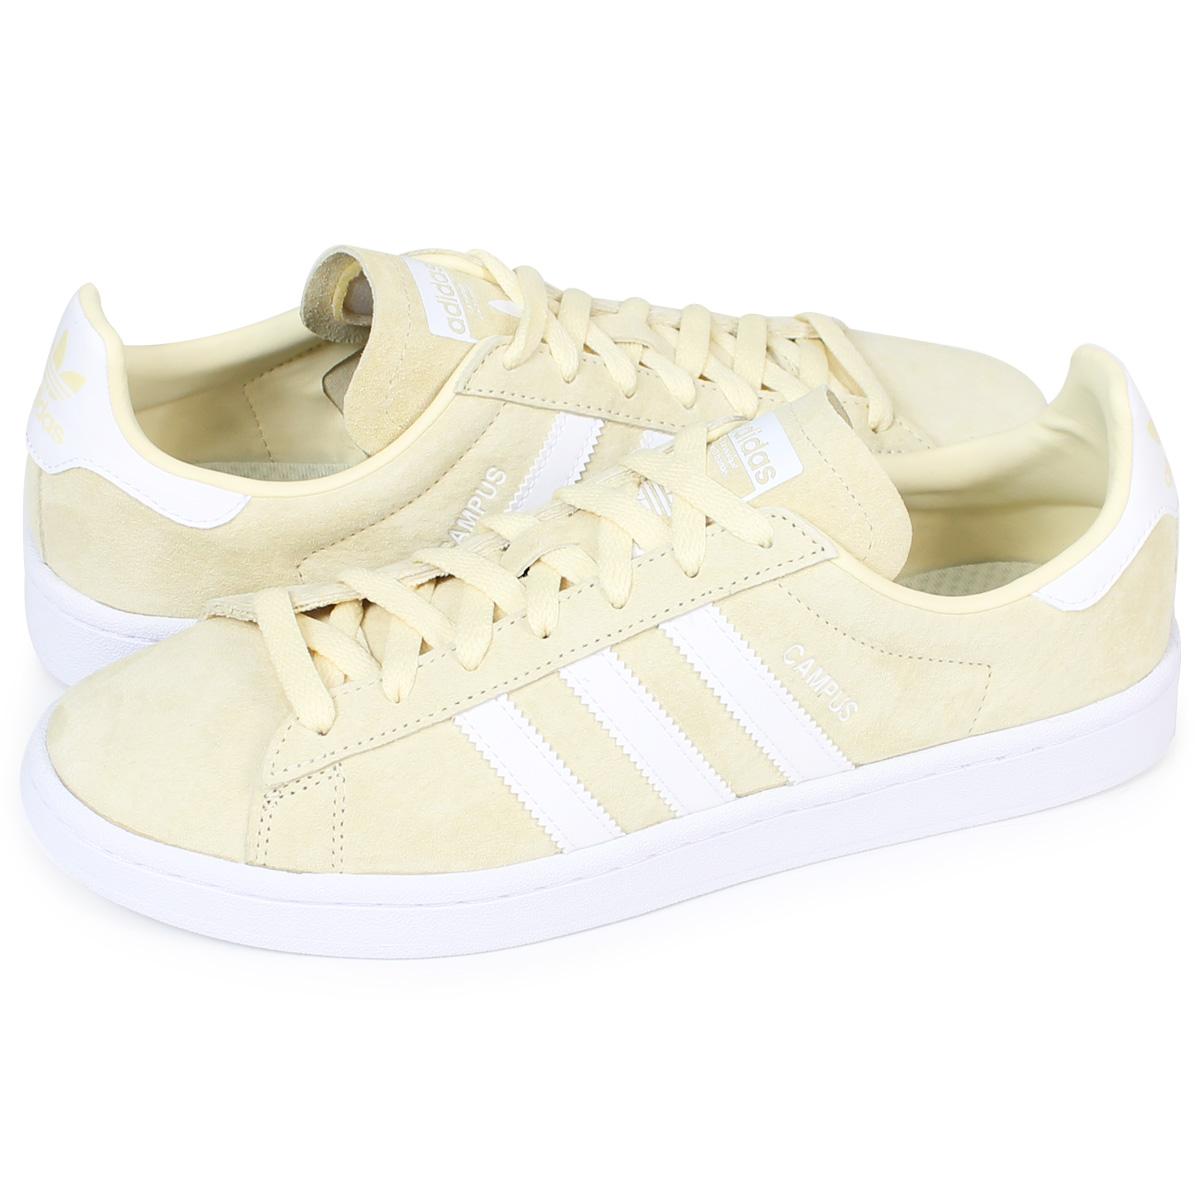 Whats up Sports  adidas originals CAMPUS Adidas campus sneakers men ... 0263f55009ad